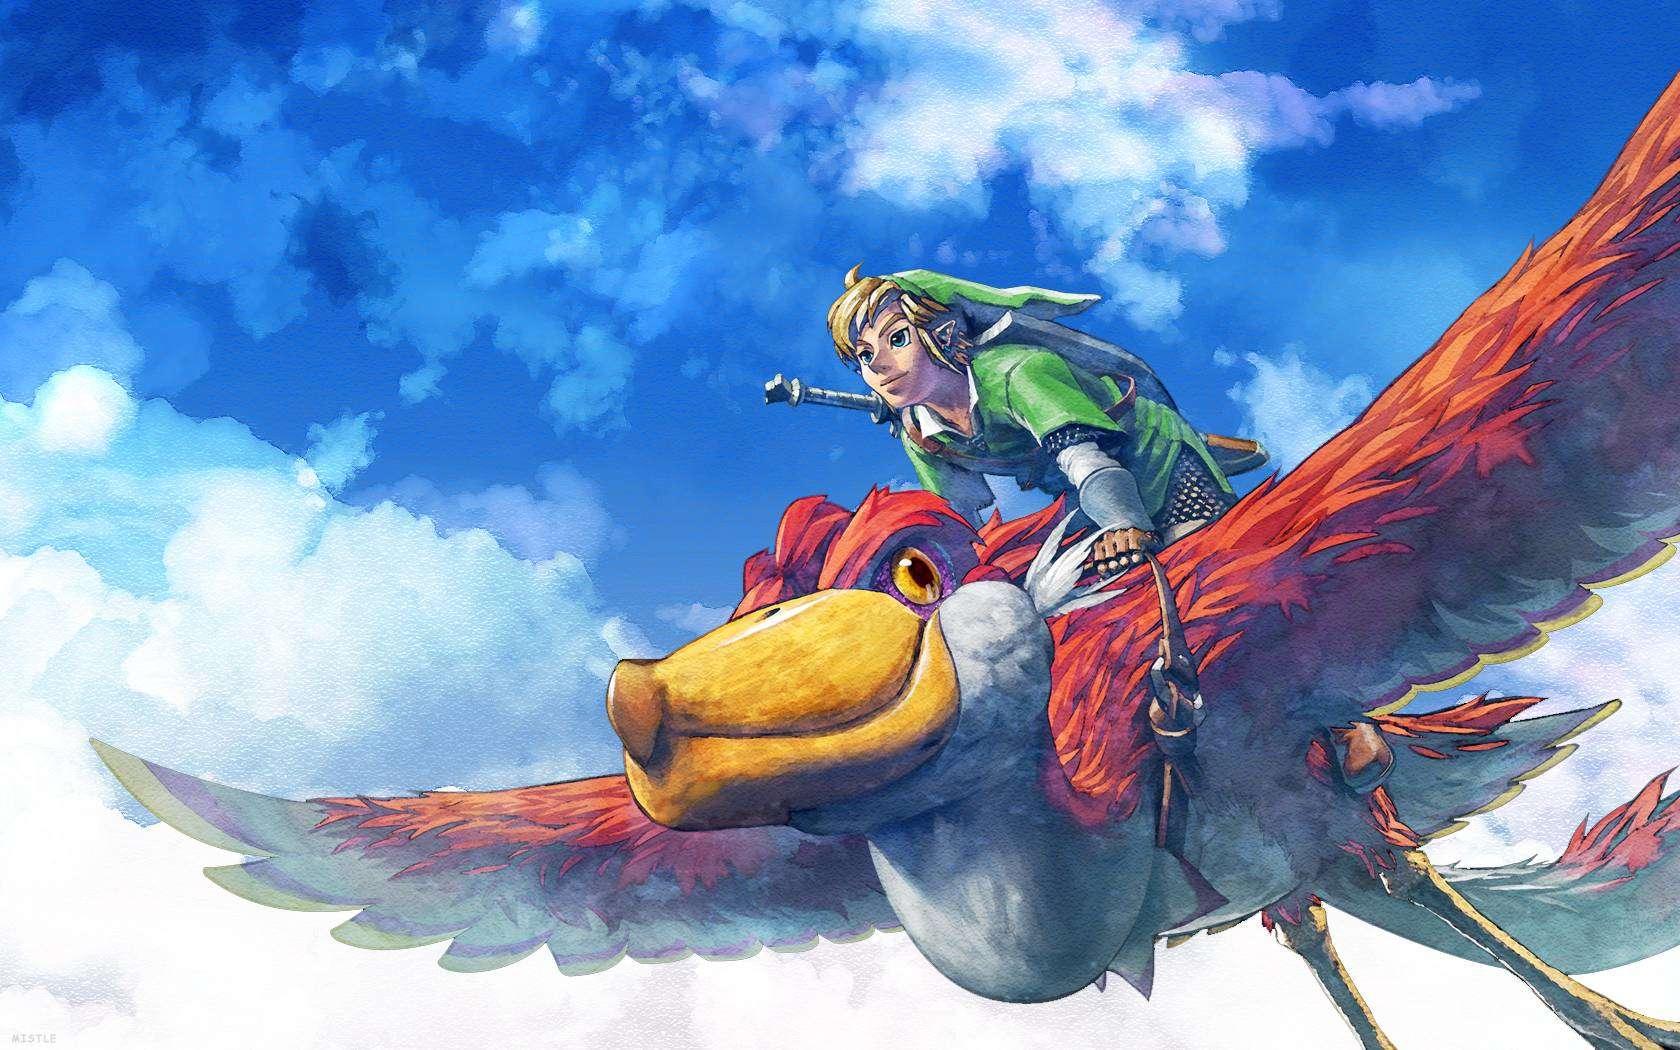 NXpress Nintendo Podcast Our favorite/least favorite Zelda games